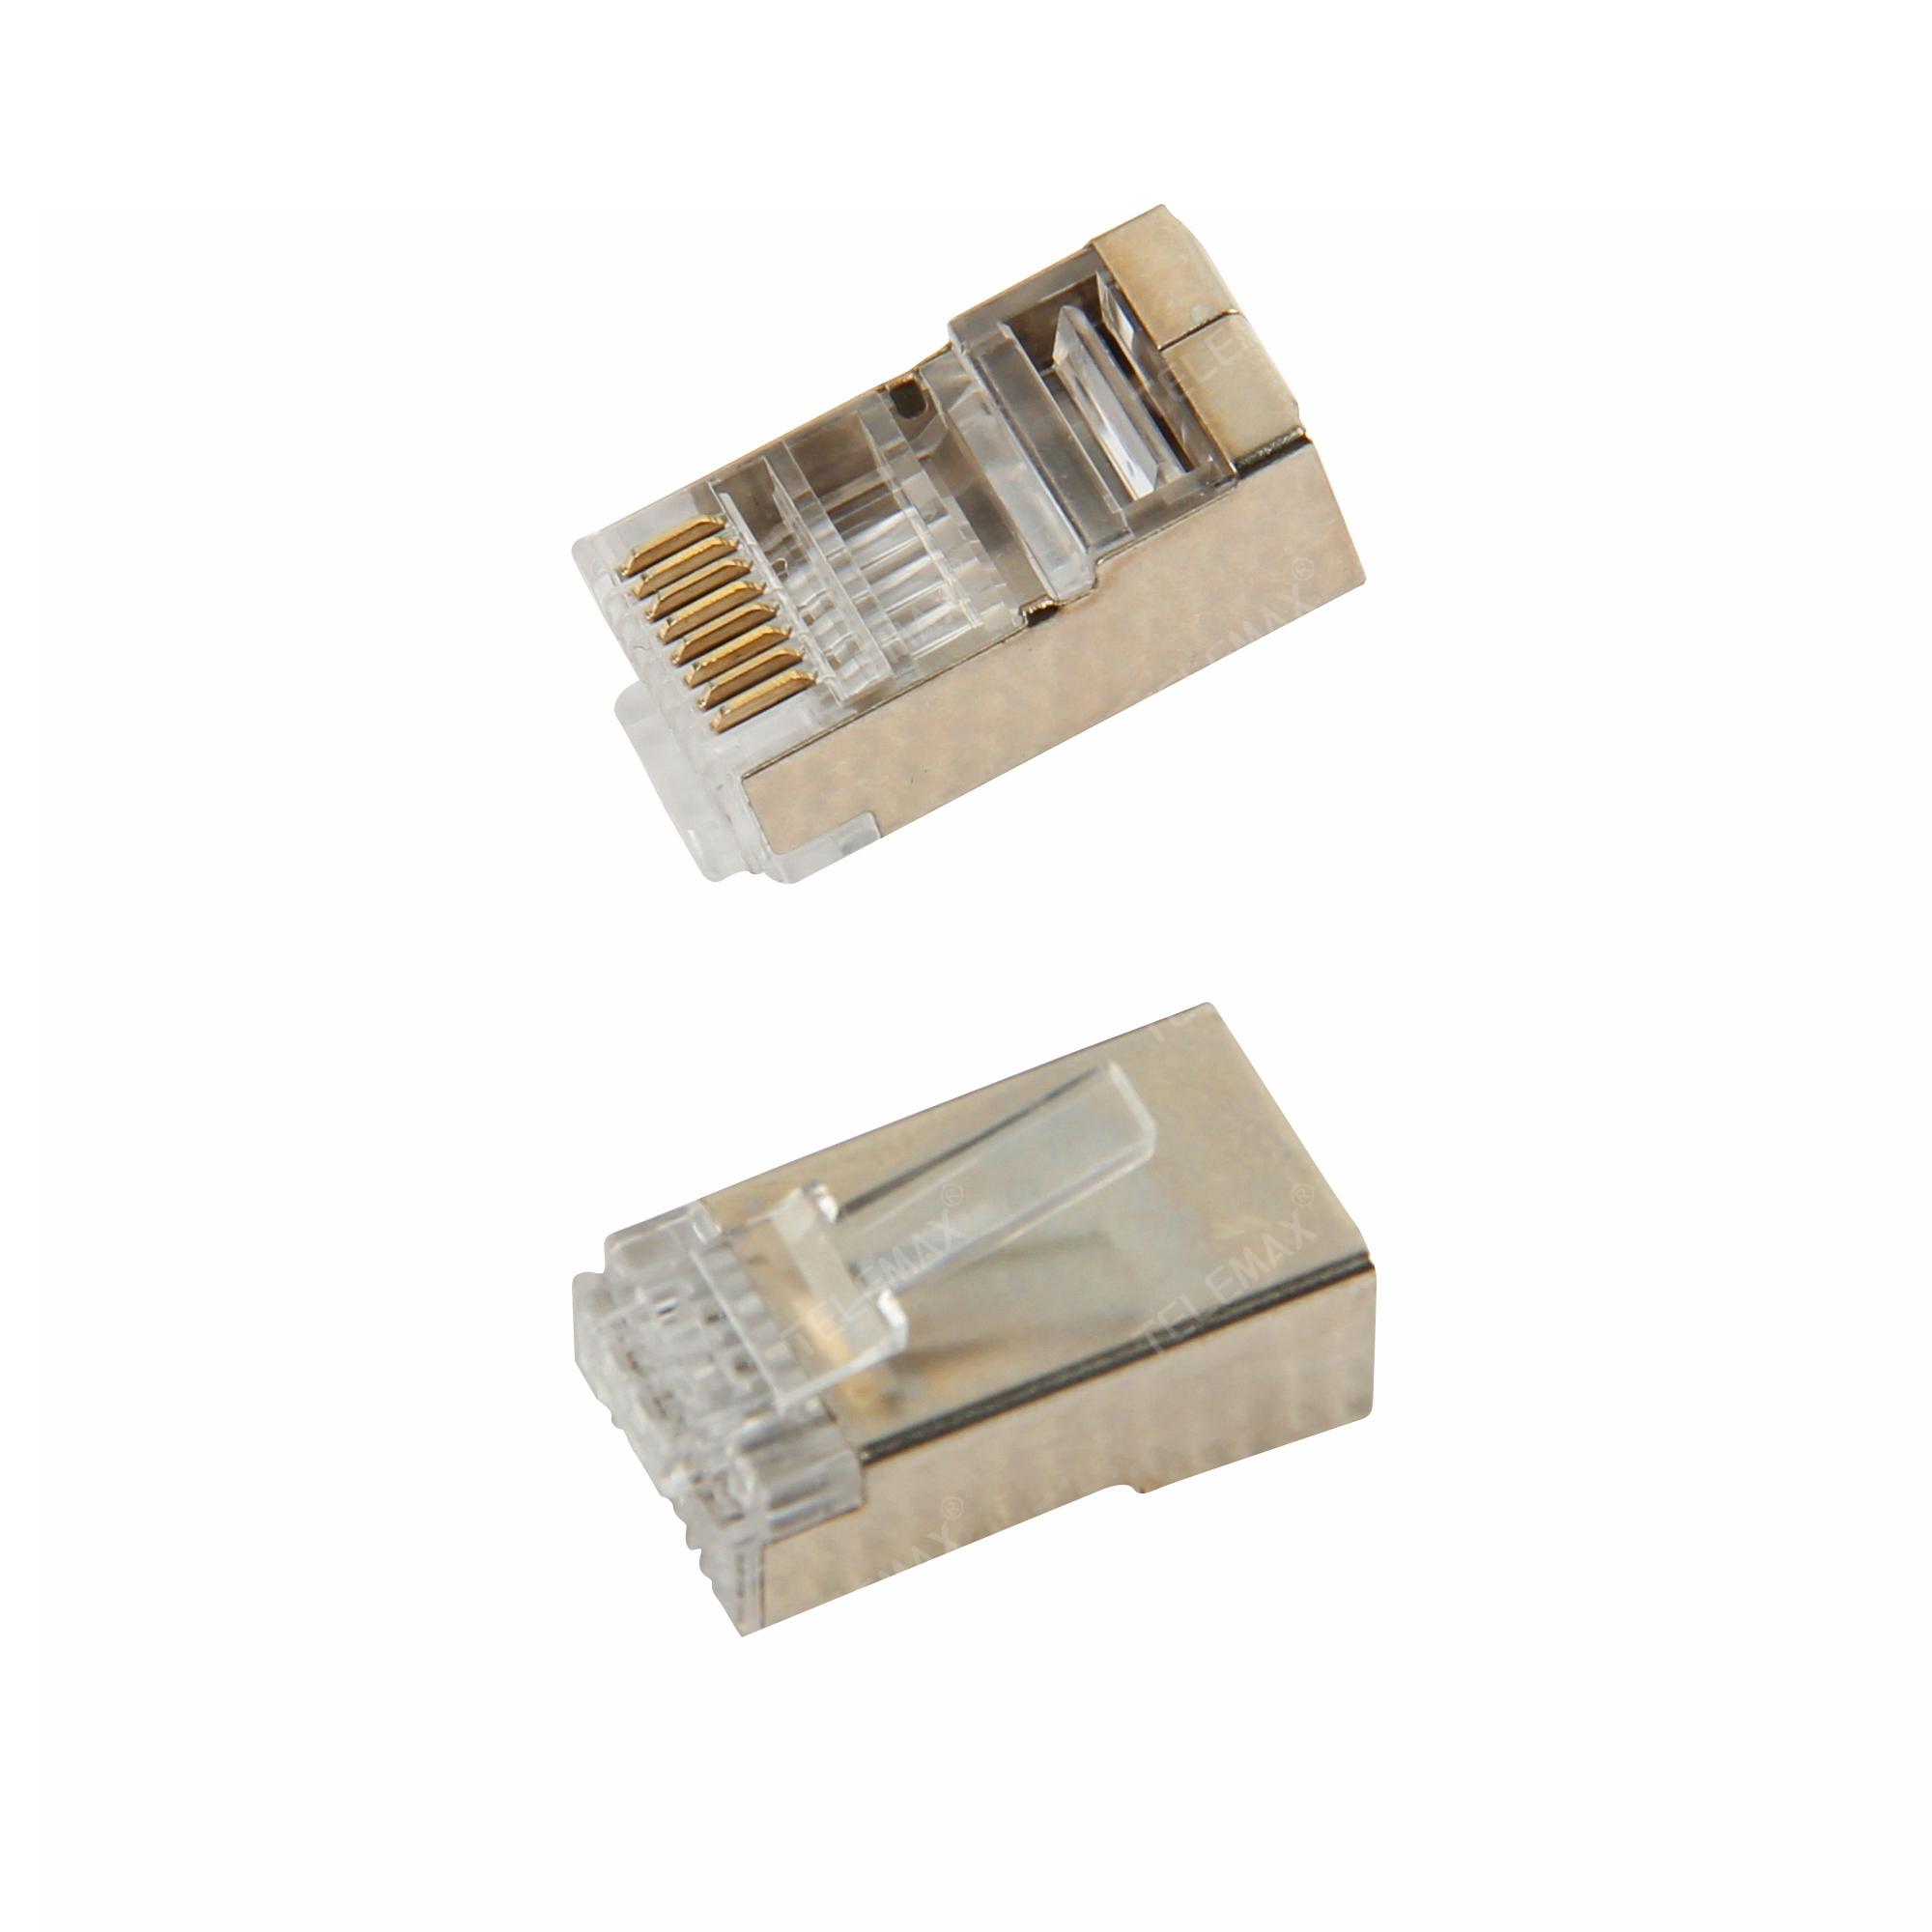 CAT6 FTP RJ45 Plug 8P8C, Golden plating 3/15/30/50u''